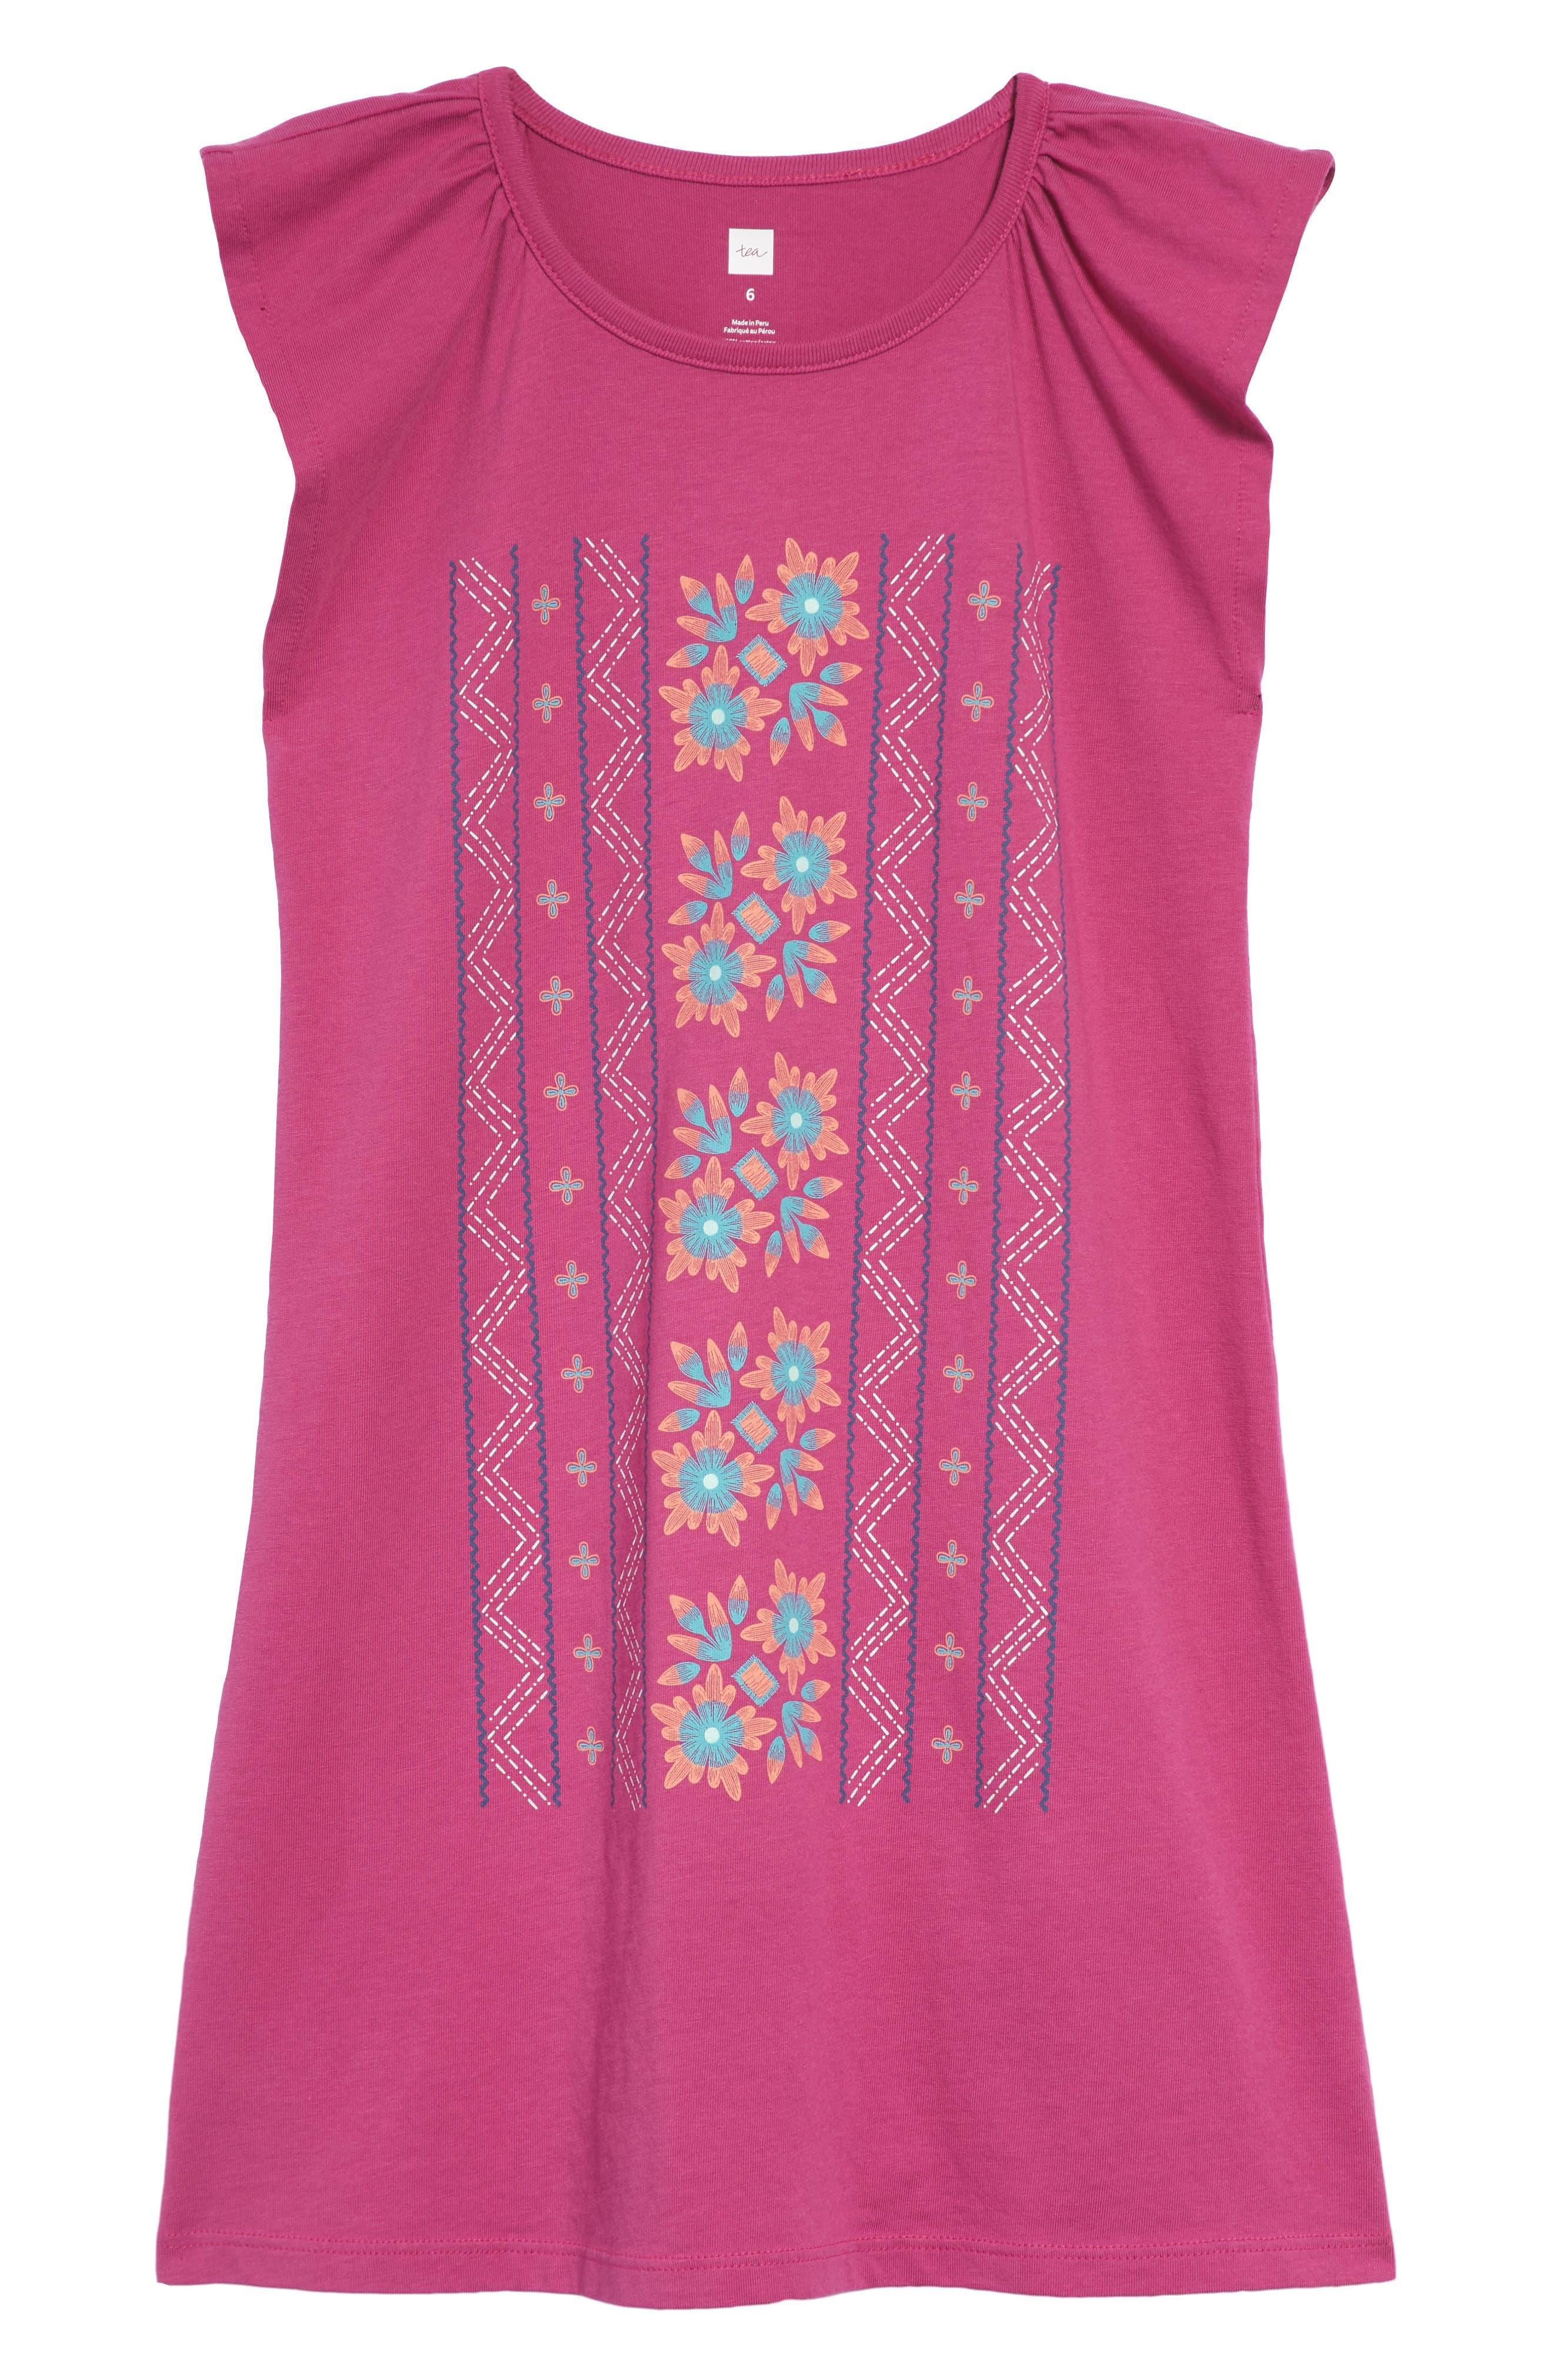 Tea Collection Floral Graphic Dress (Toddler Girls, Little Girls & Big Girls)